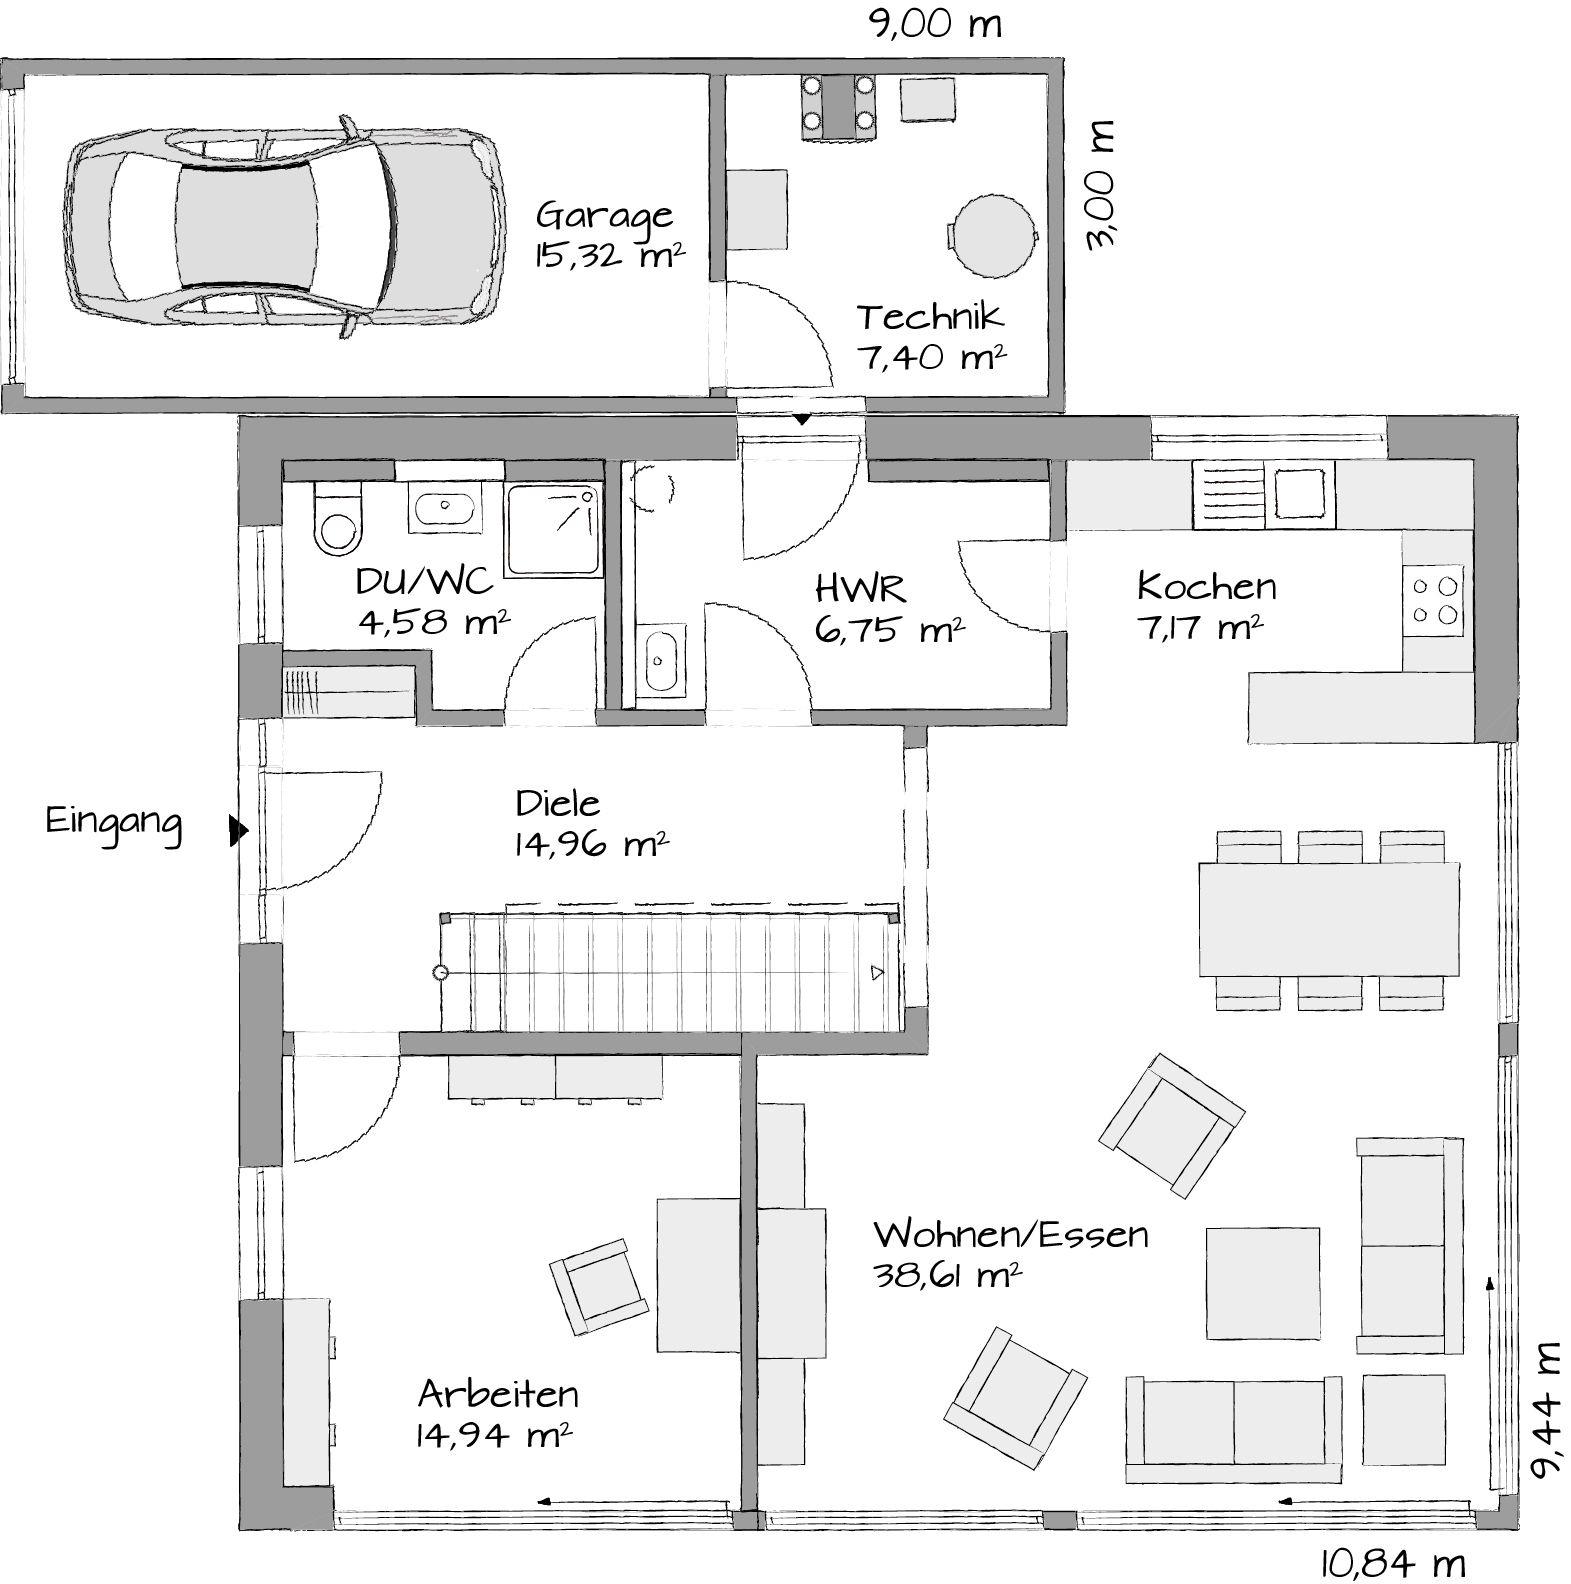 Satteldachhaus Lanos 2 1730 Haus Grundriss Hausbau Grundriss Doppelhaus Grundriss